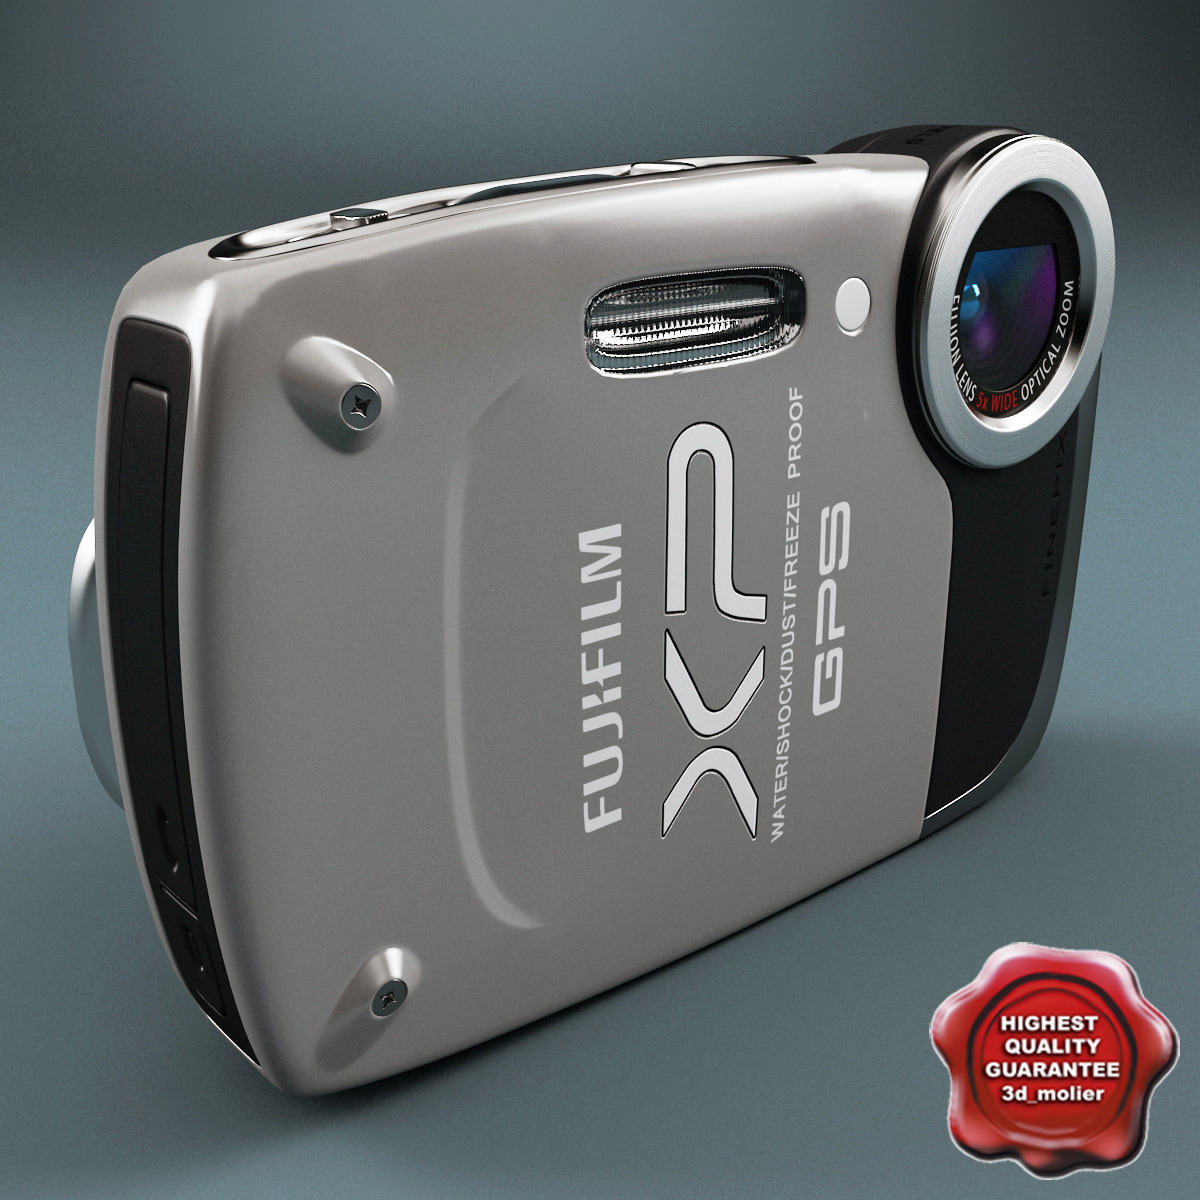 Fujifilm_FinePix_XP30_Gray_00.jpg